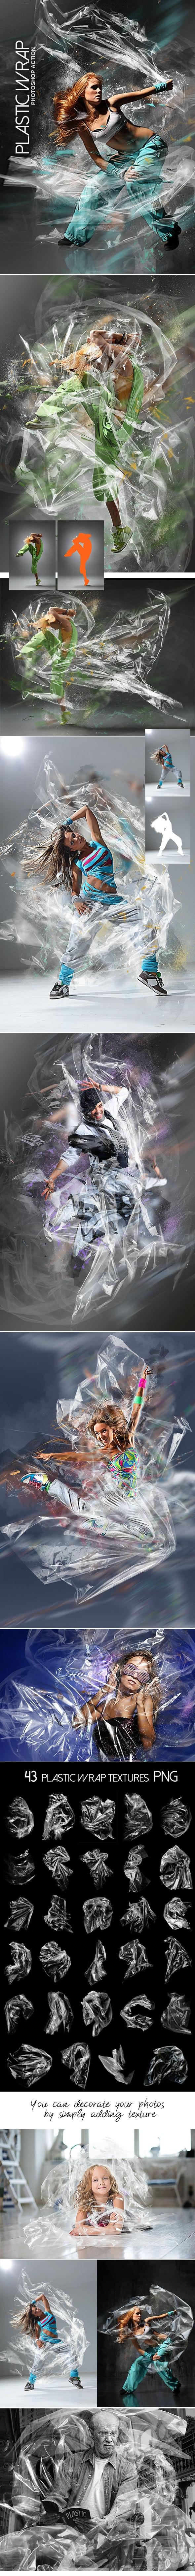 Plastic Wrap Photoshop Action - Photo Effects Actions